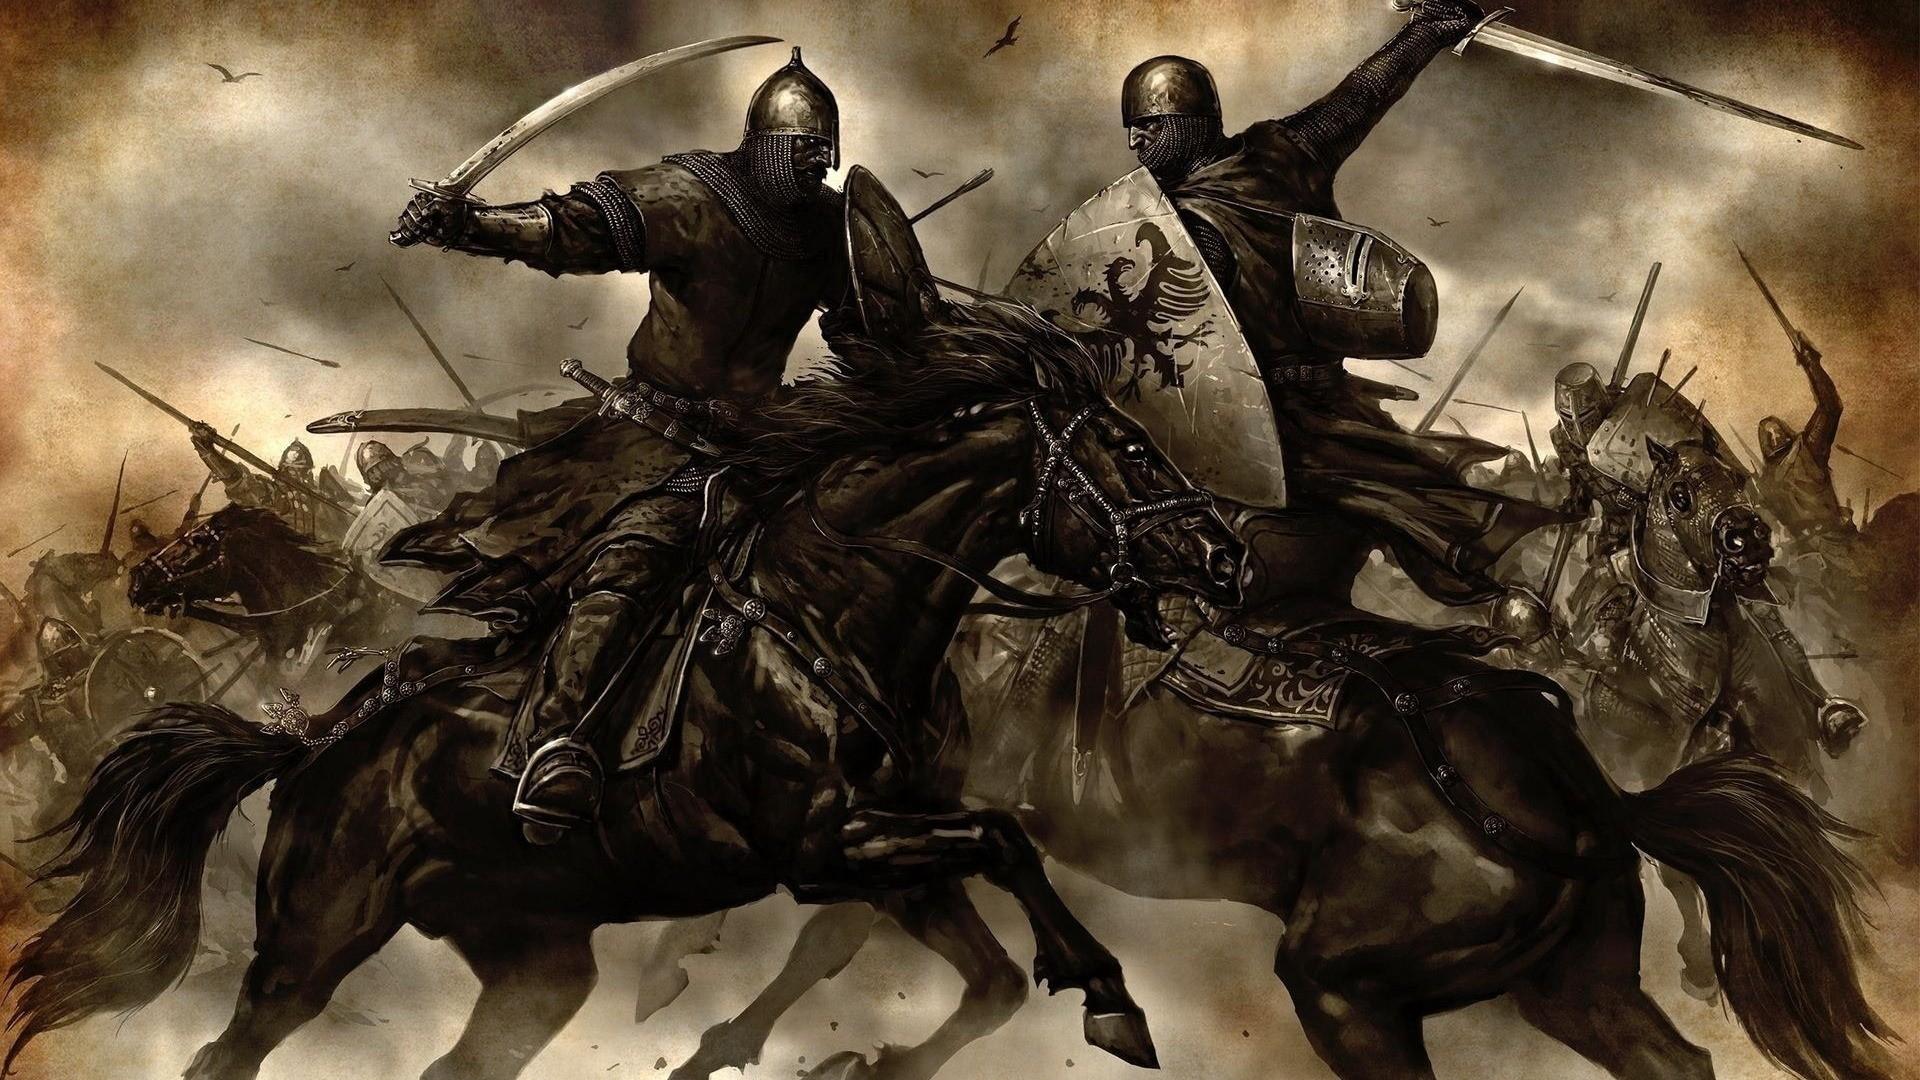 … knight wallpaper wallpapersafari …